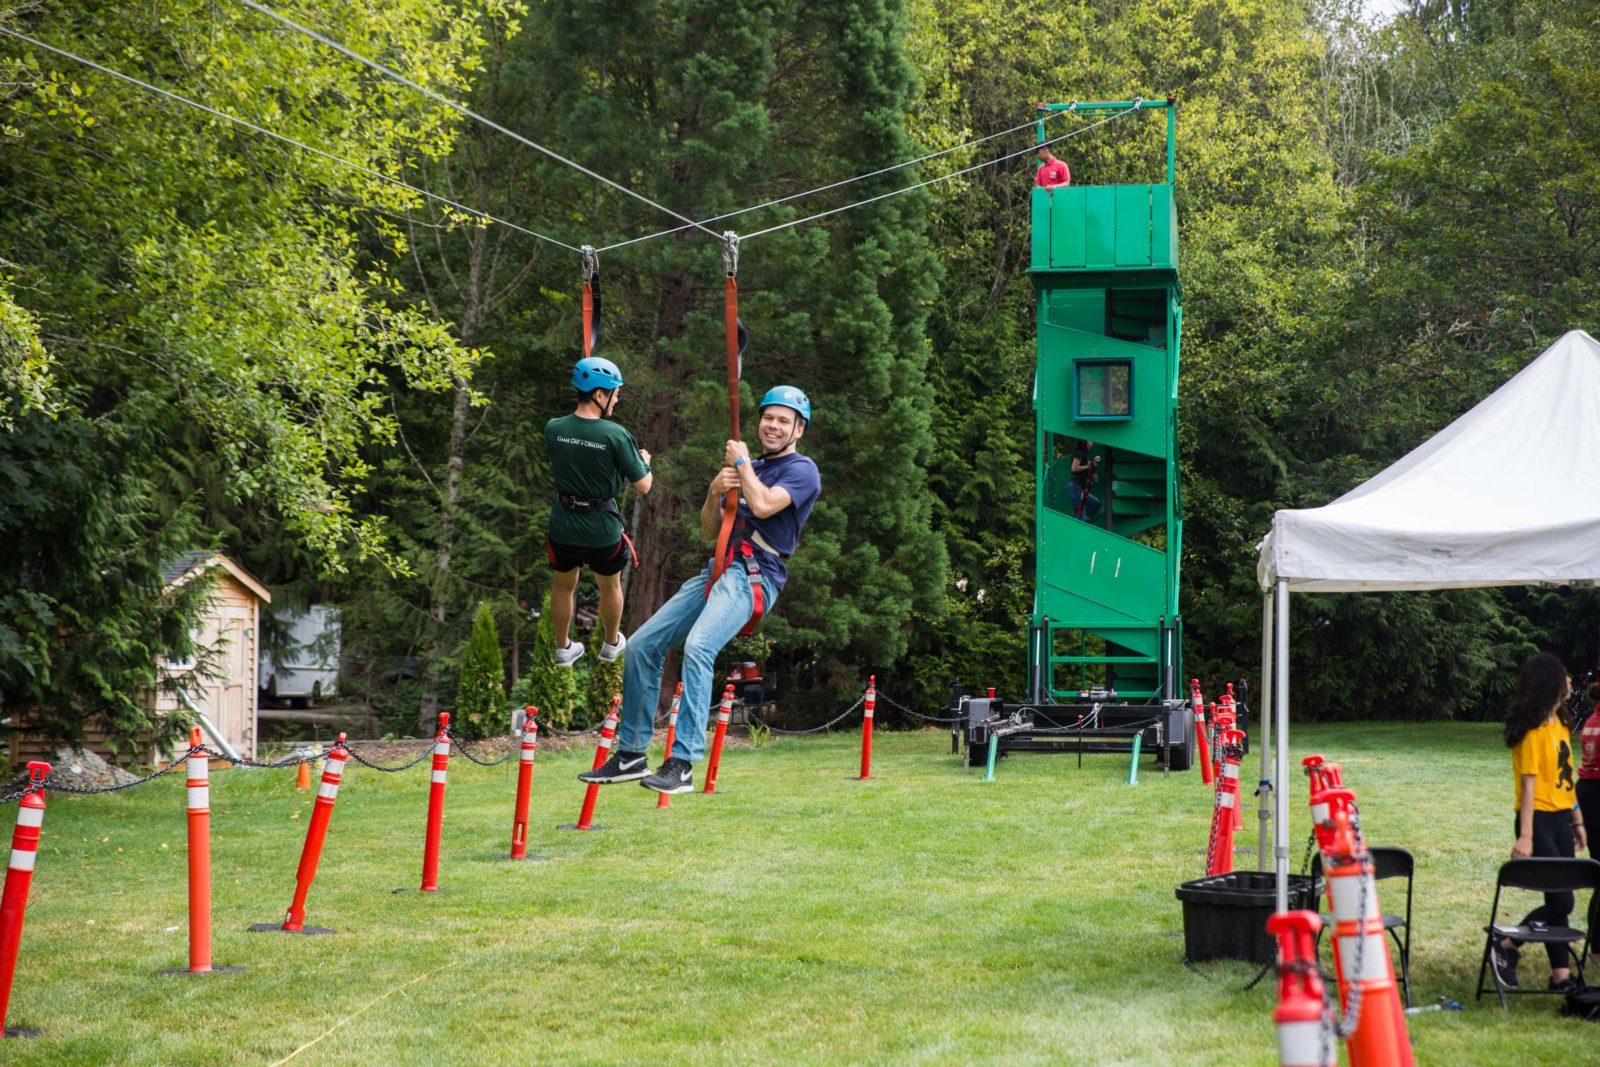 giant zipline